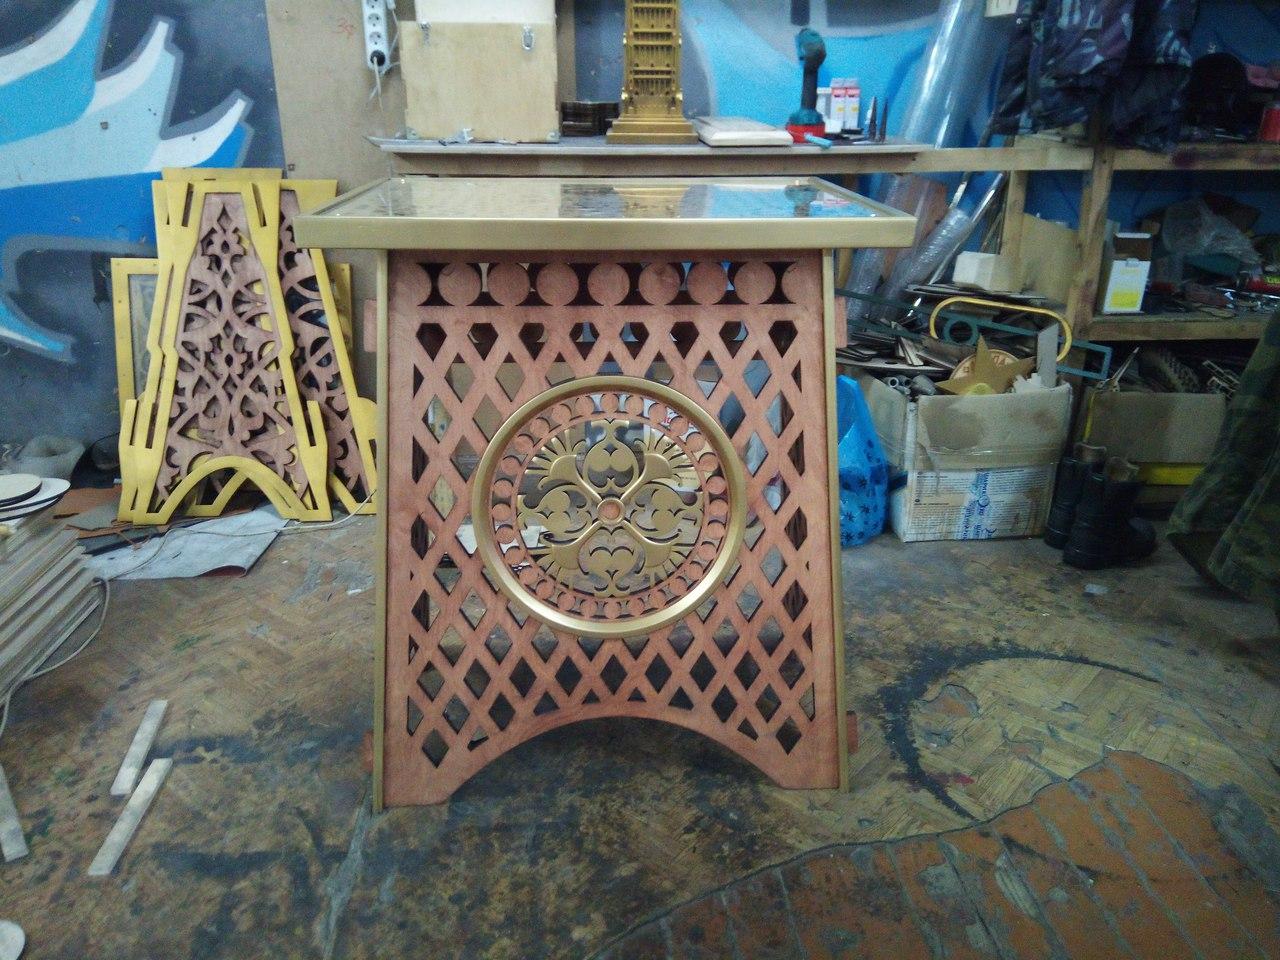 Laser Cut Stylish Openwork Table Free CDR Vectors Art